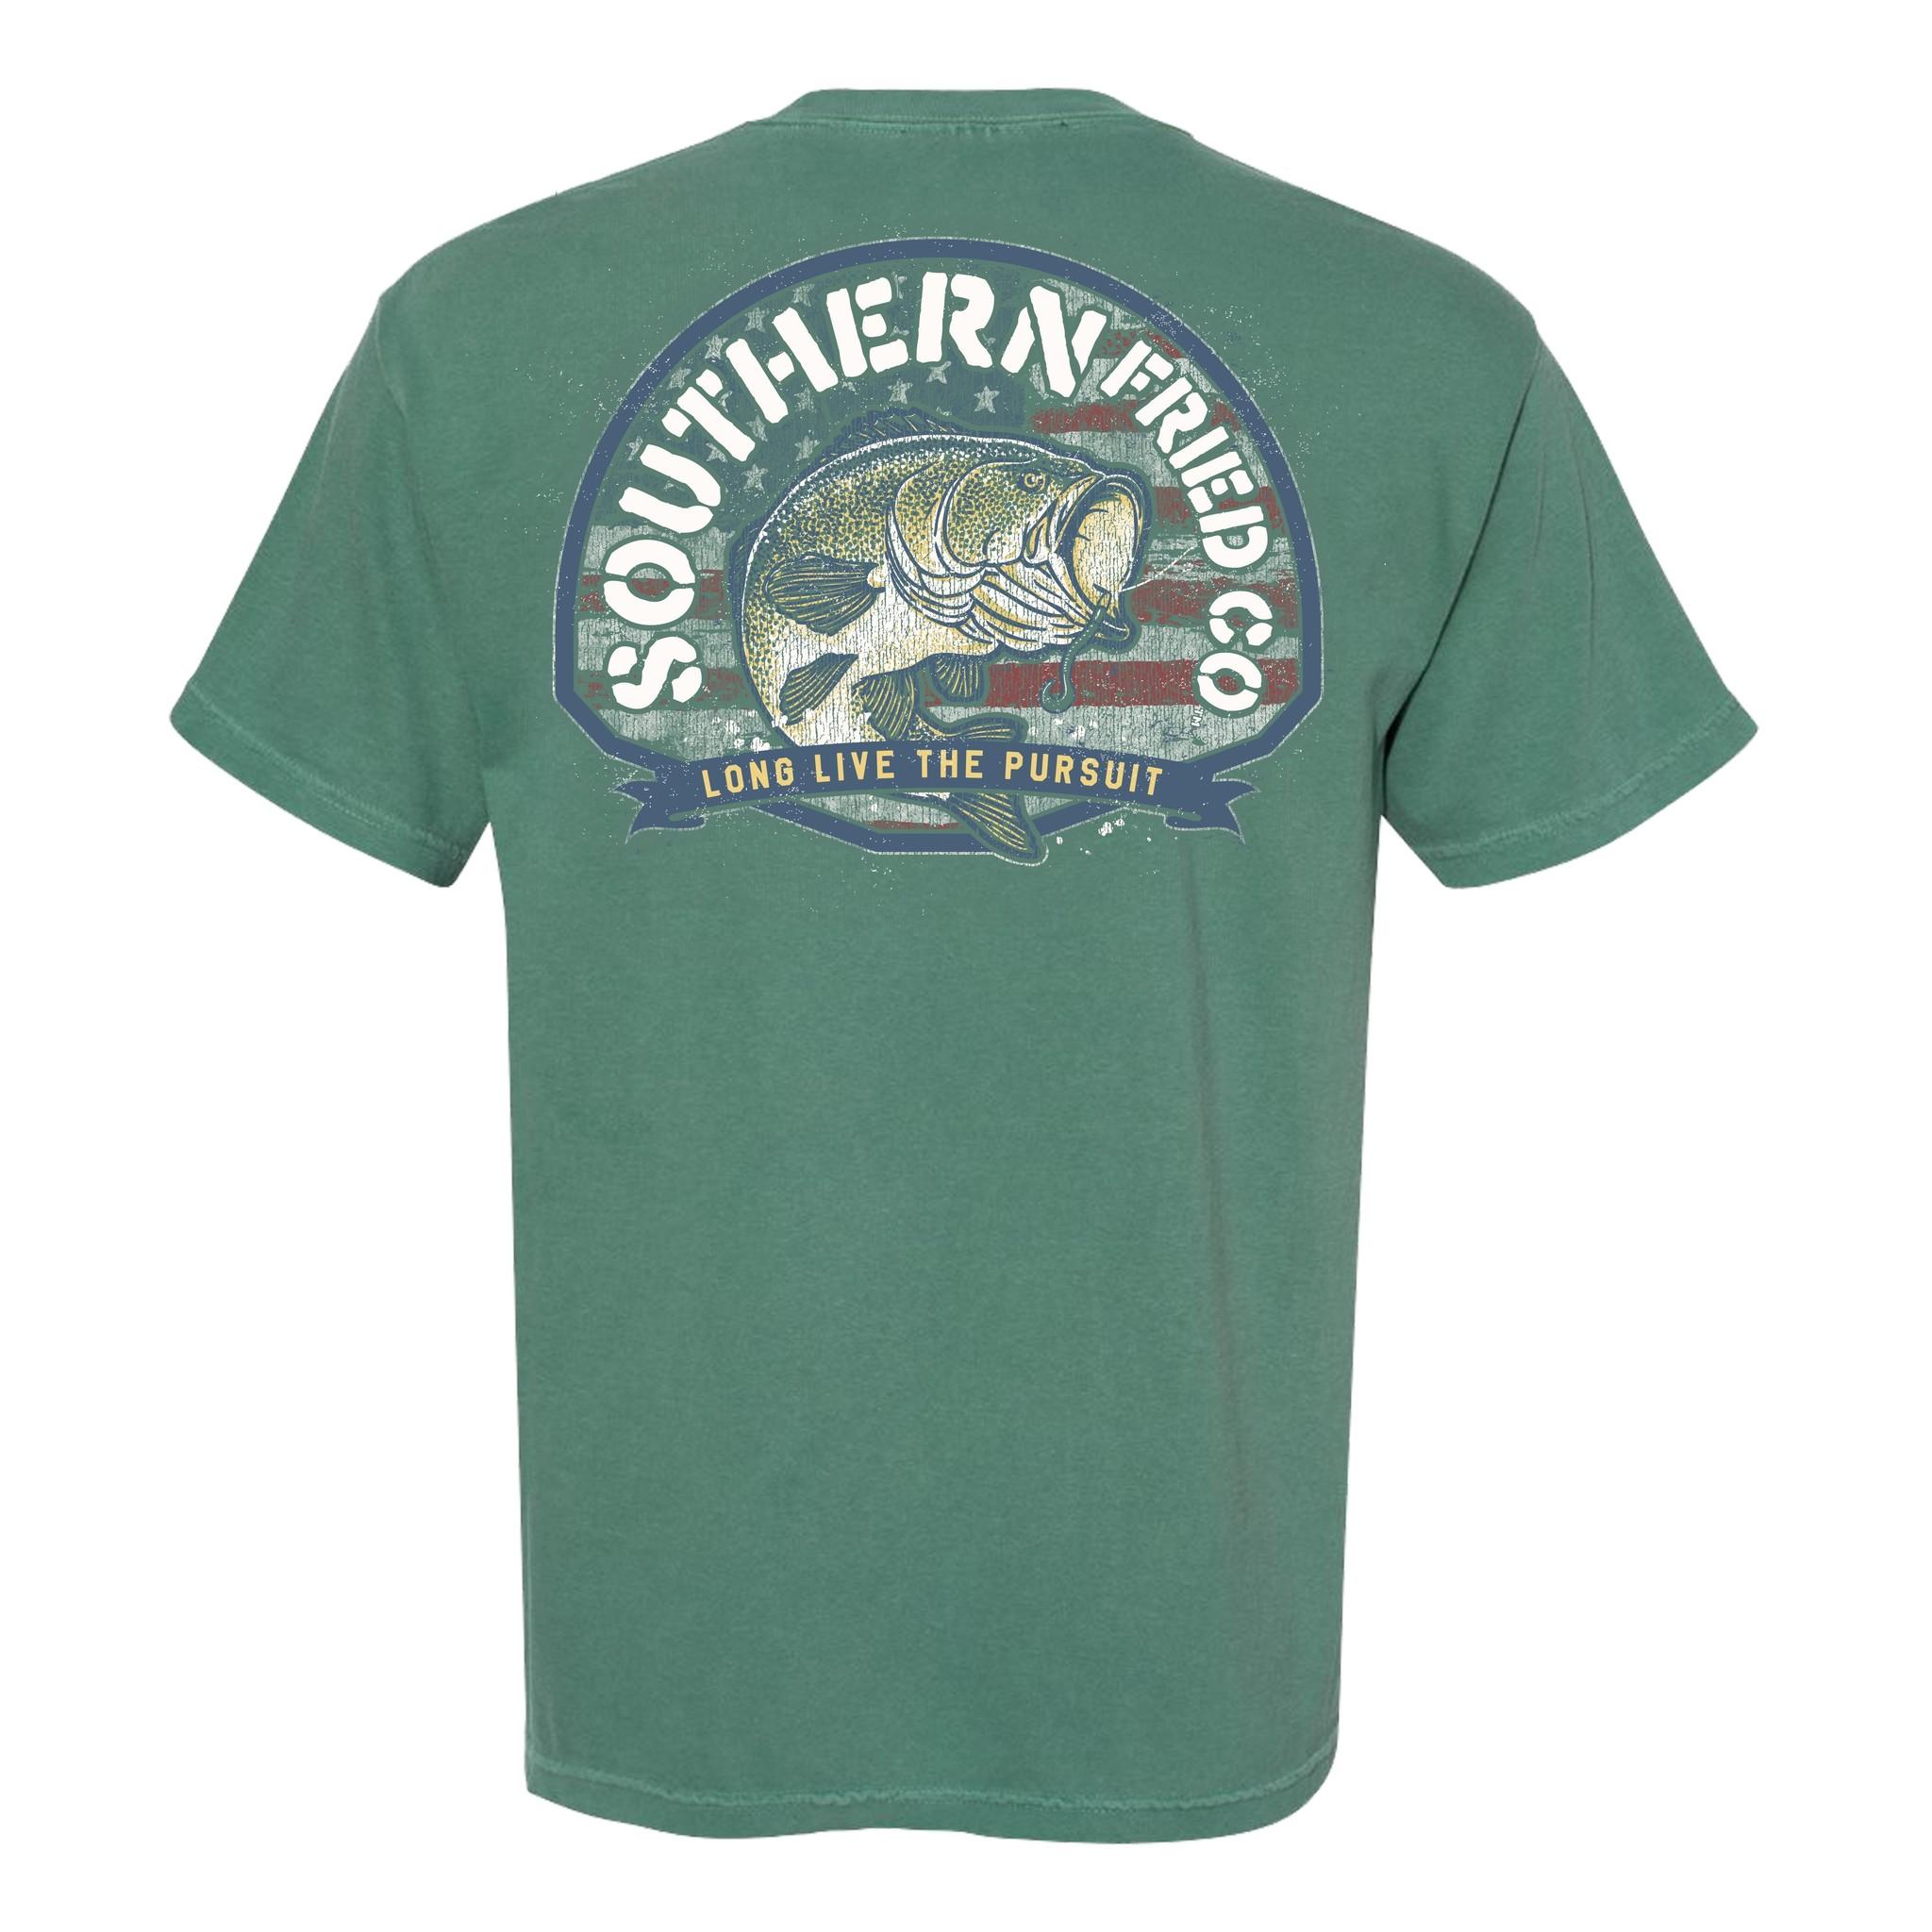 Southern Fried Cotton  American Bass SS Tee - Light Green